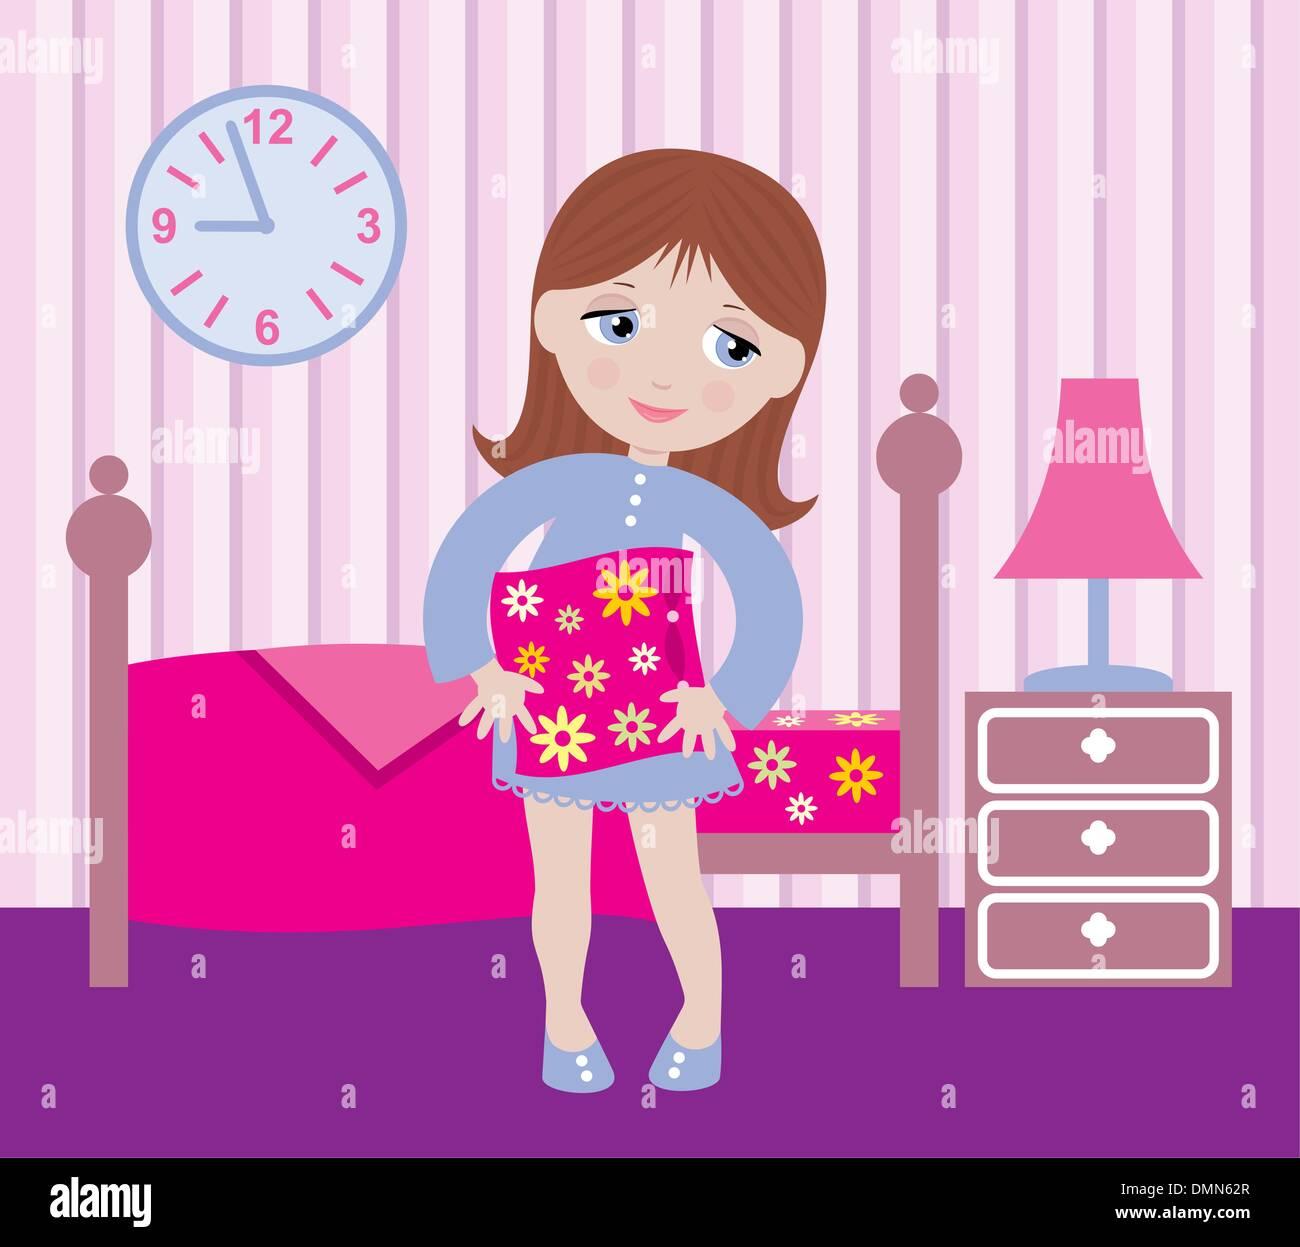 Verträumte Mädchen ins Bett gehen Stockbild